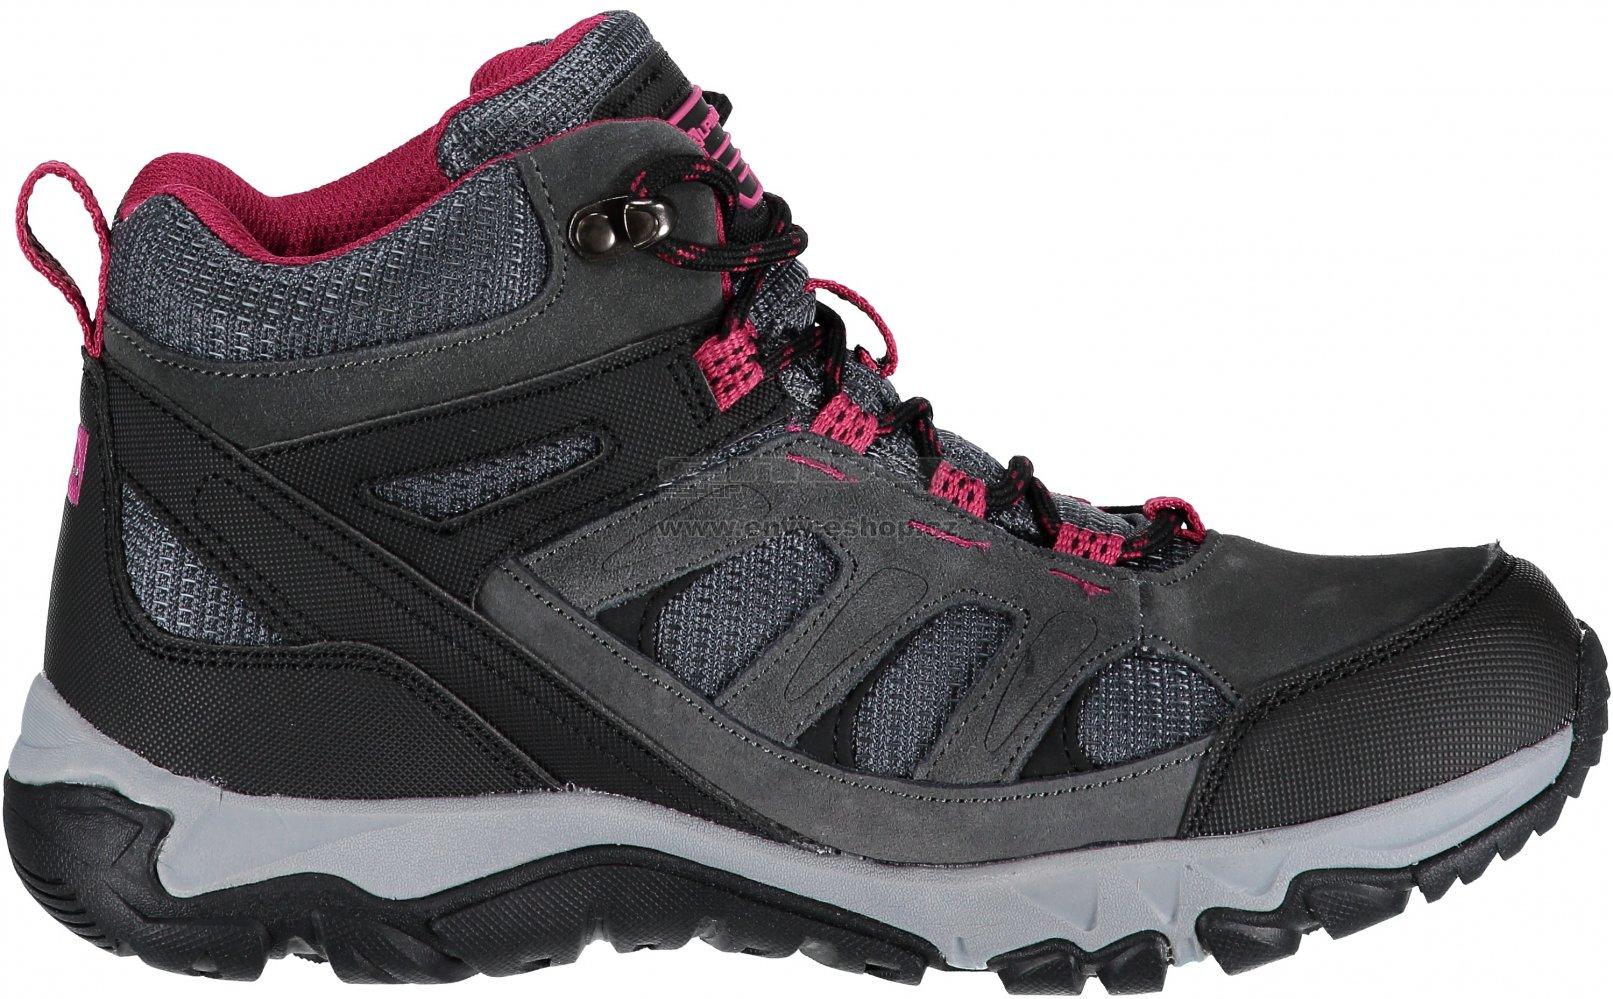 Dámská turistická obuv ALPINE PRO ARNETTA LBTM176 TMAVĚ ŠEDÁ ... 915d343840